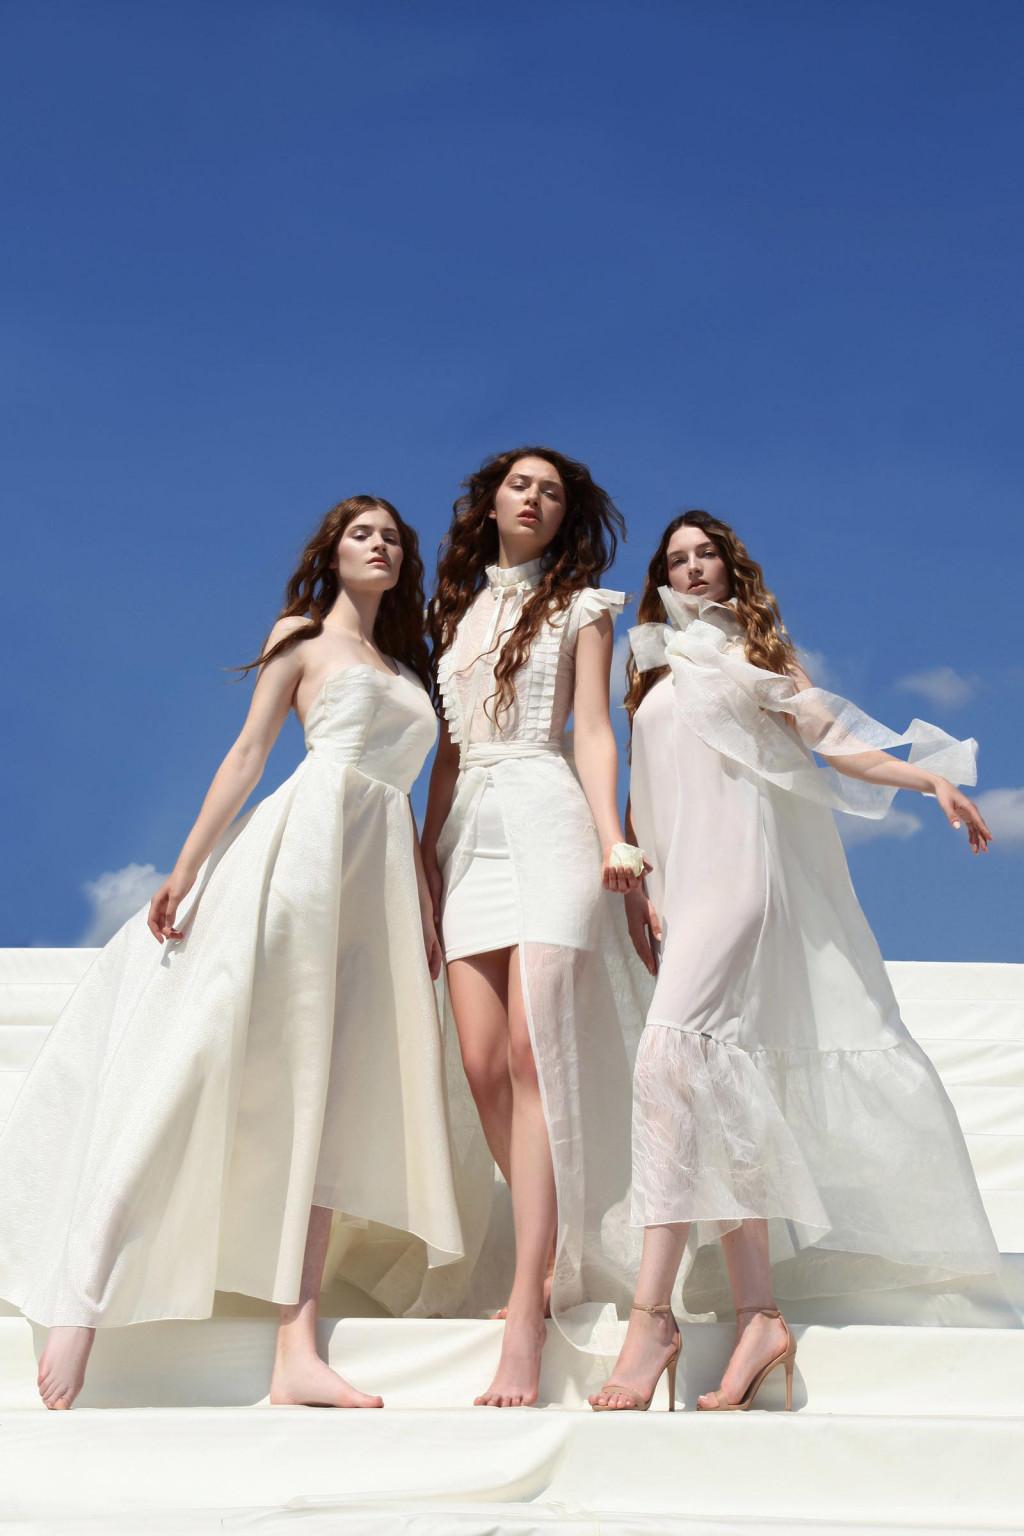 kampanja Hippy Garden, Đurđica Vorkapić, moda u karanteni